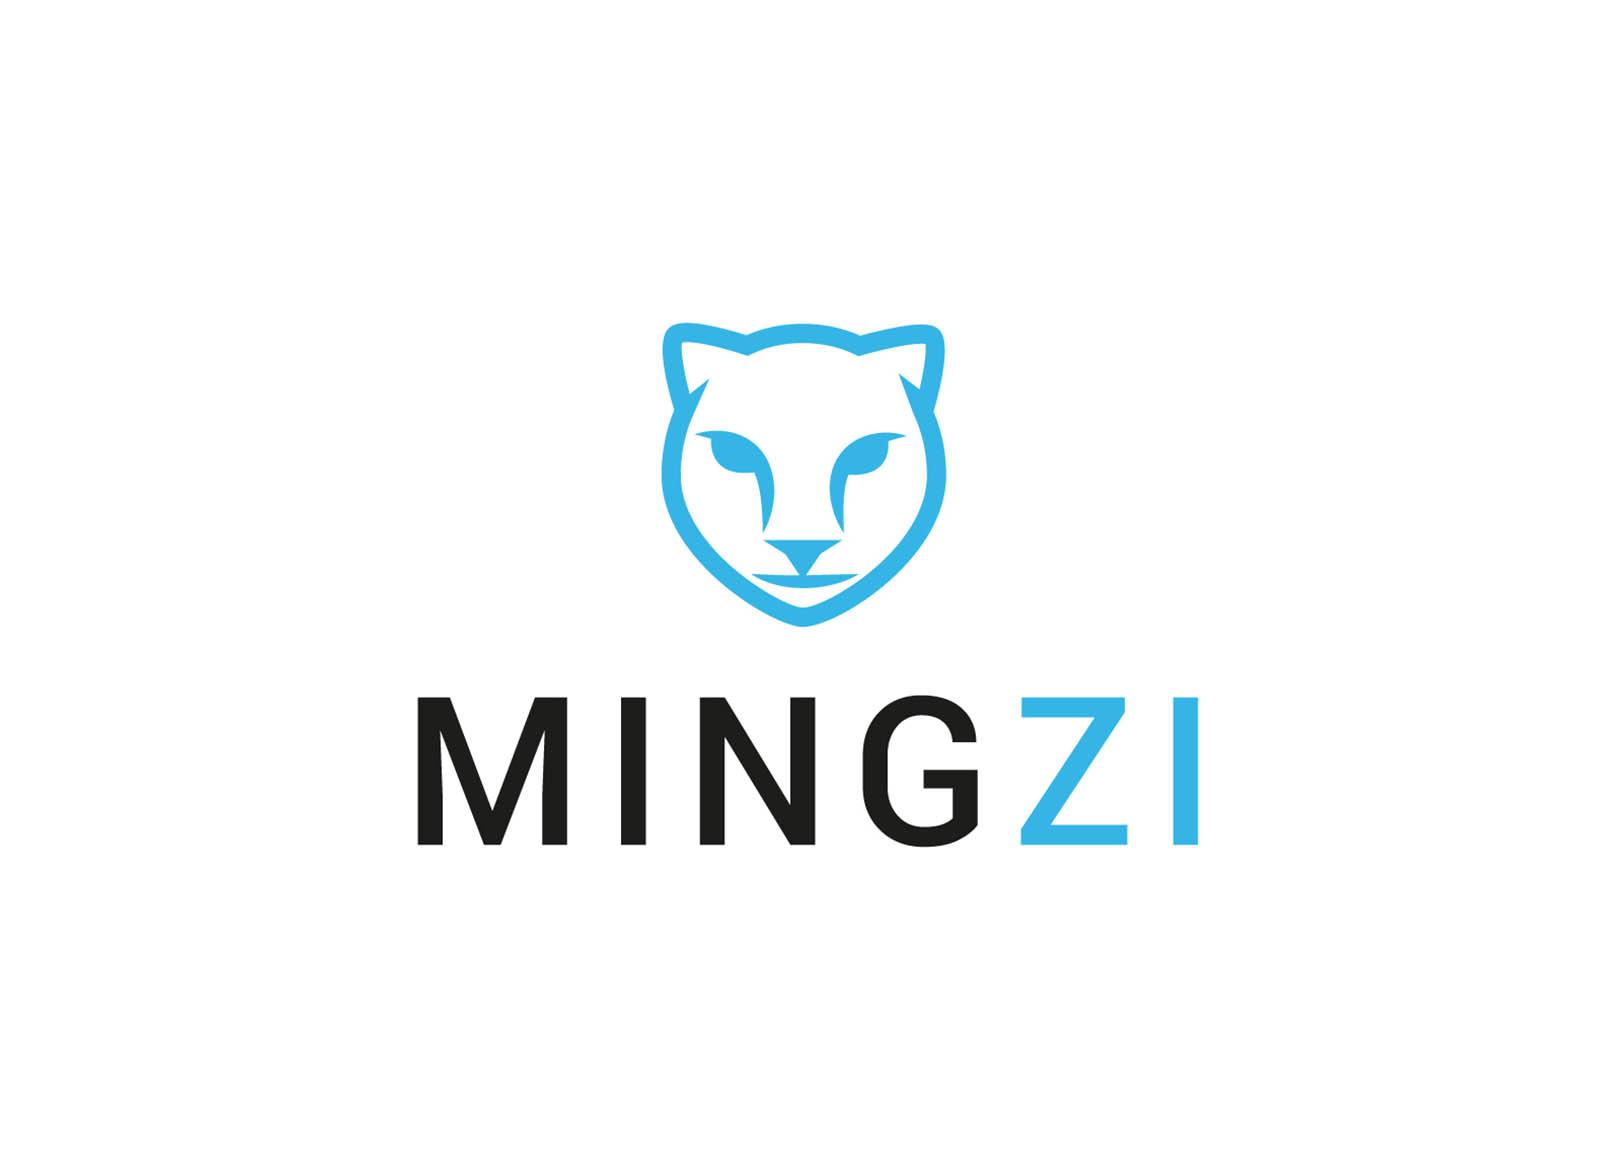 Logotype Mingzi - graphiste freelance Lyon - Laurent Pischiutta